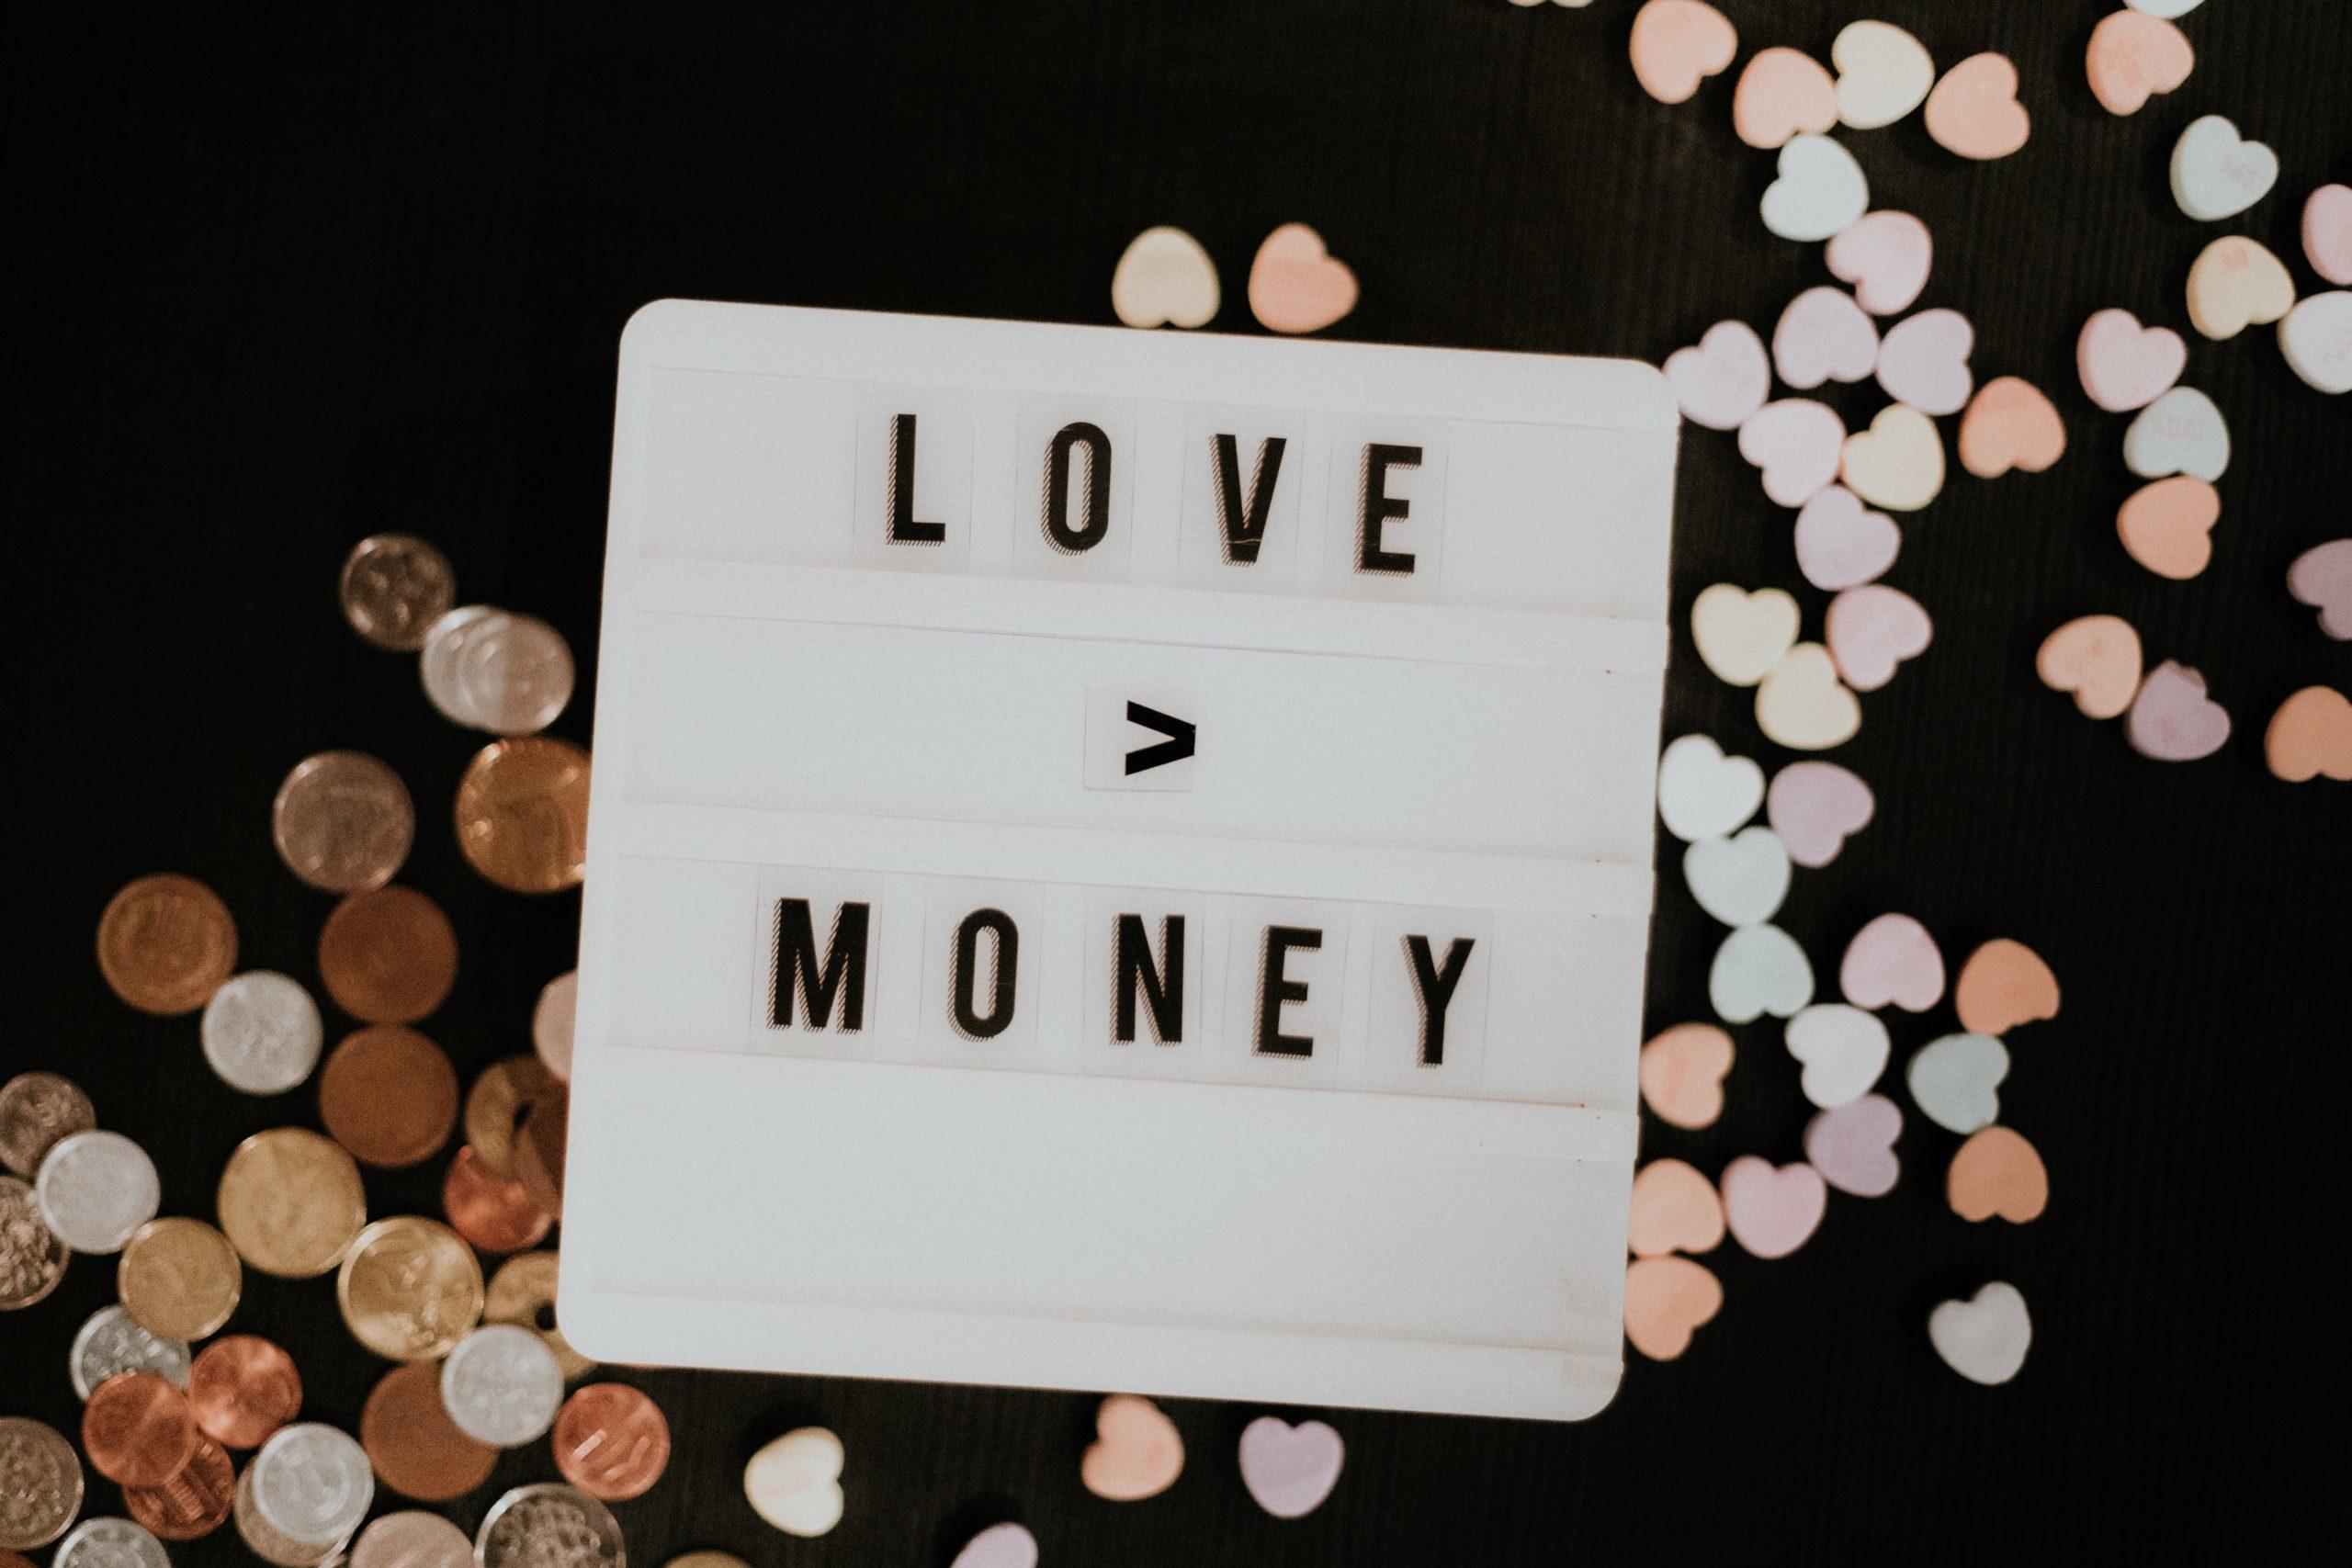 Lessons Learned From Elder Family Financial Exploitation